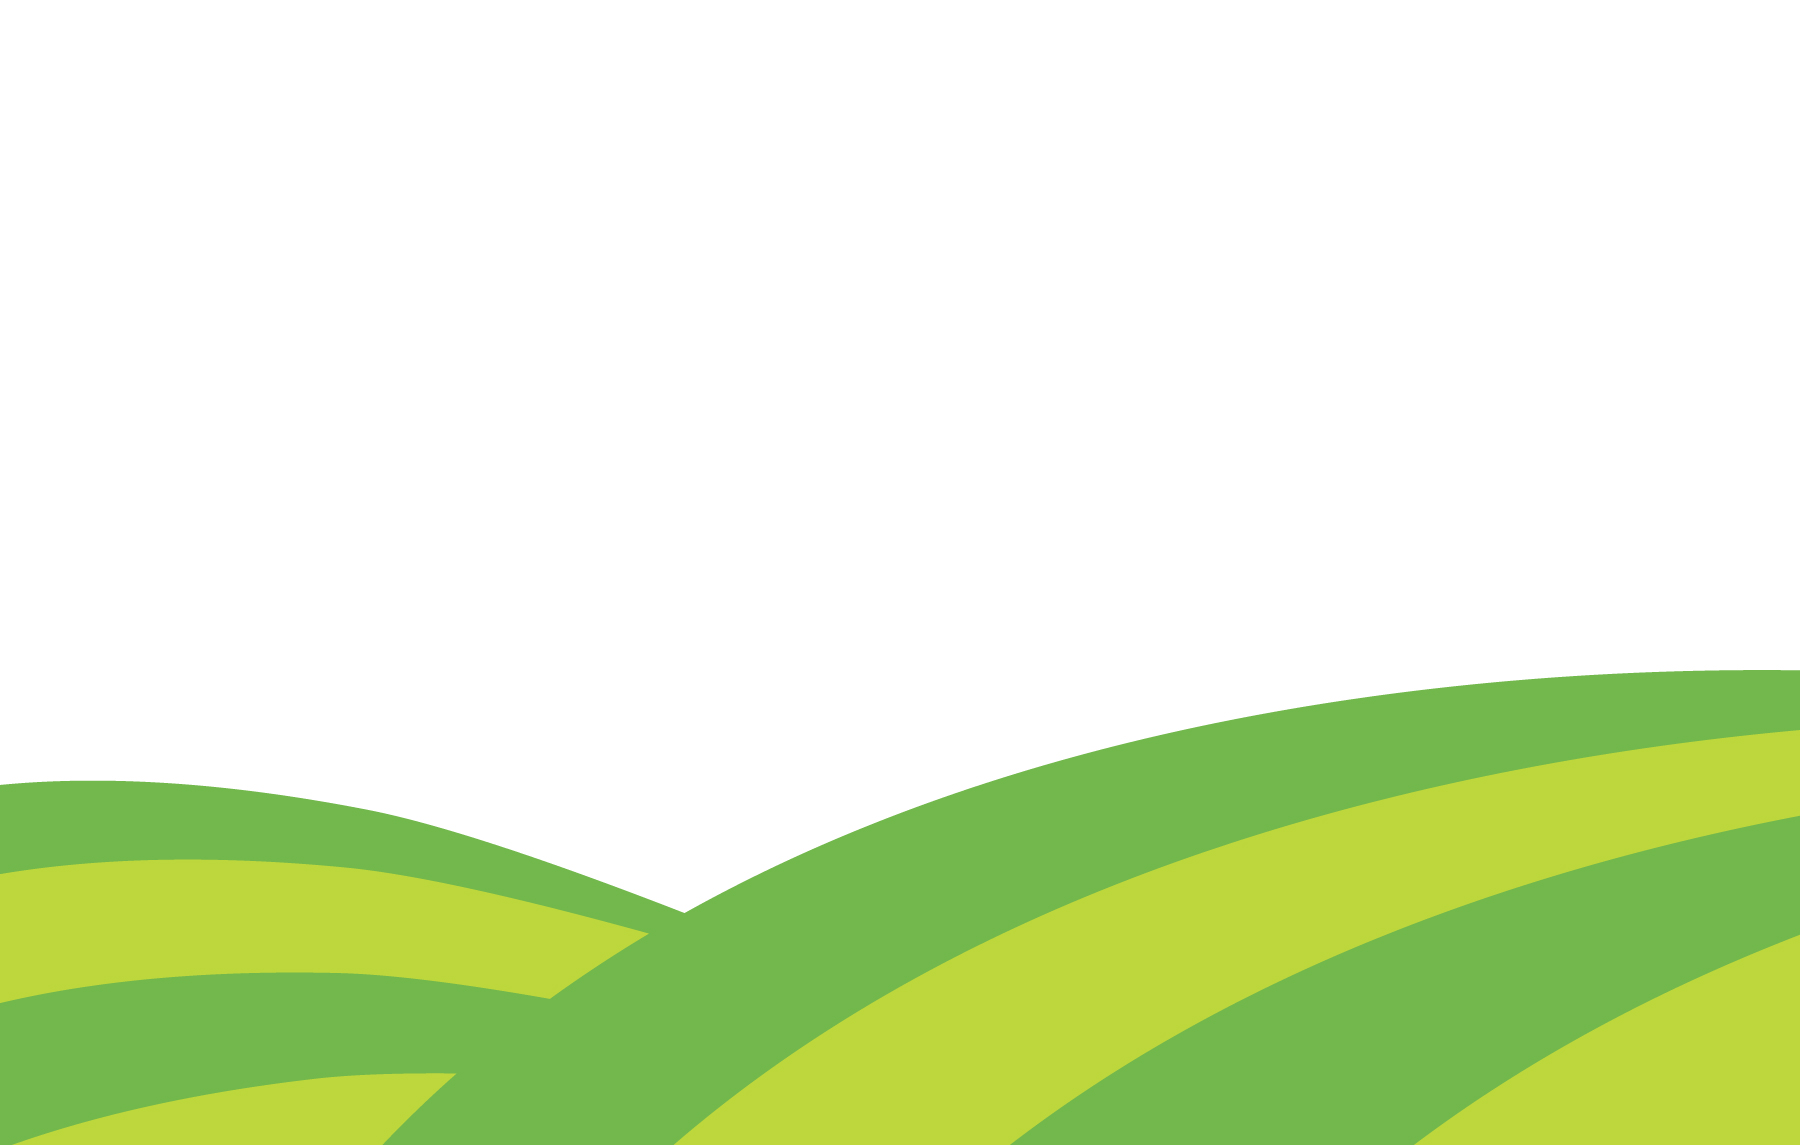 1800x1145 Free Rolling Hills Vector Illustration